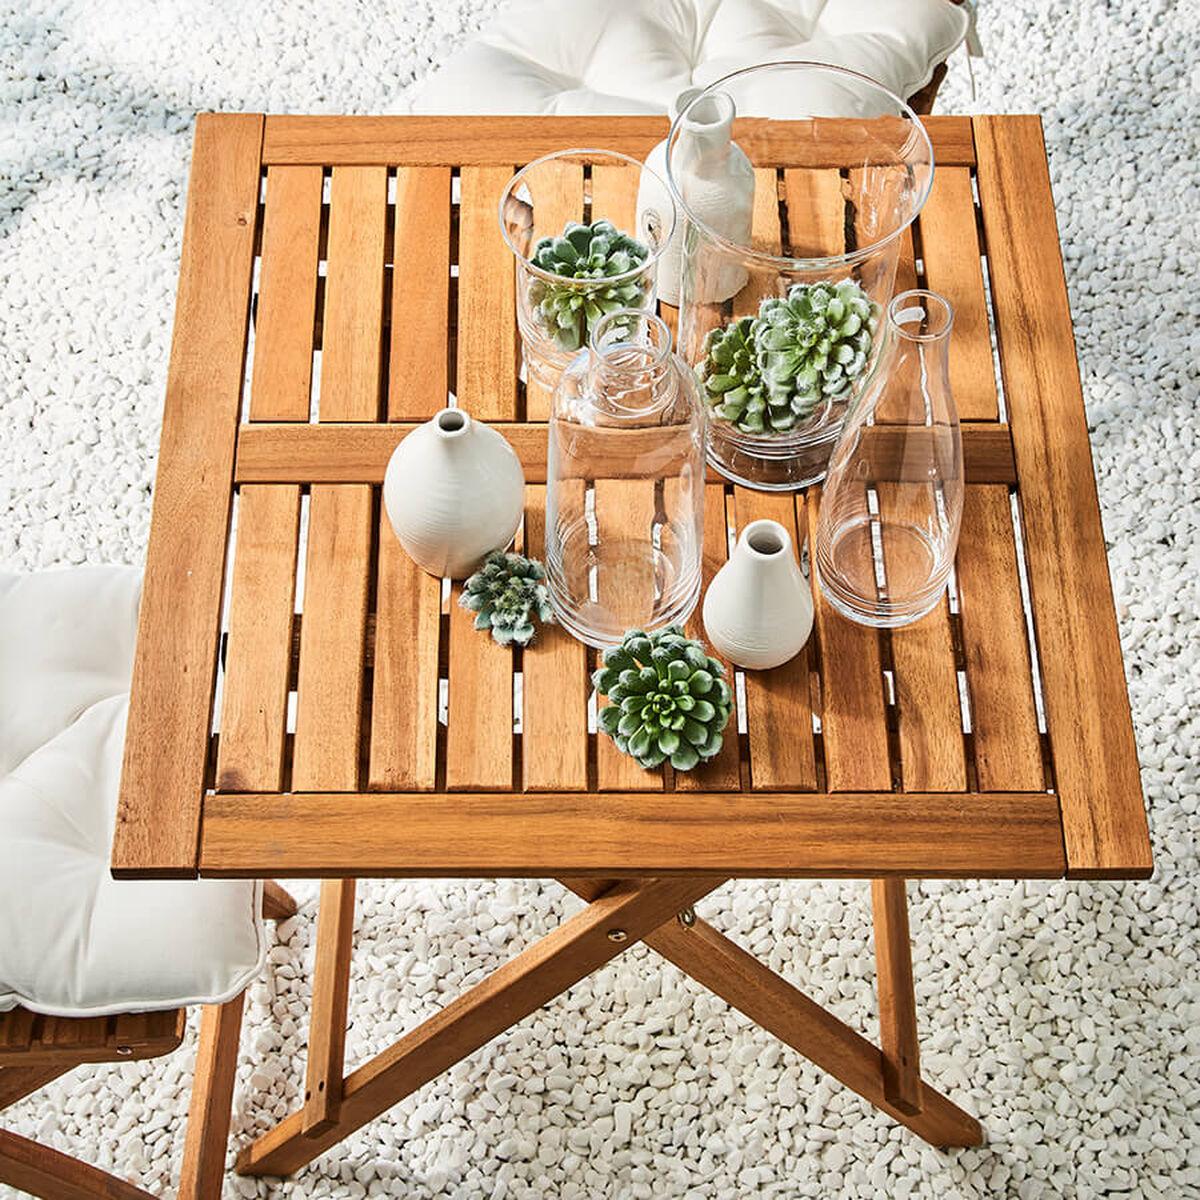 gartentische online kaufen metall holz korb butlers. Black Bedroom Furniture Sets. Home Design Ideas